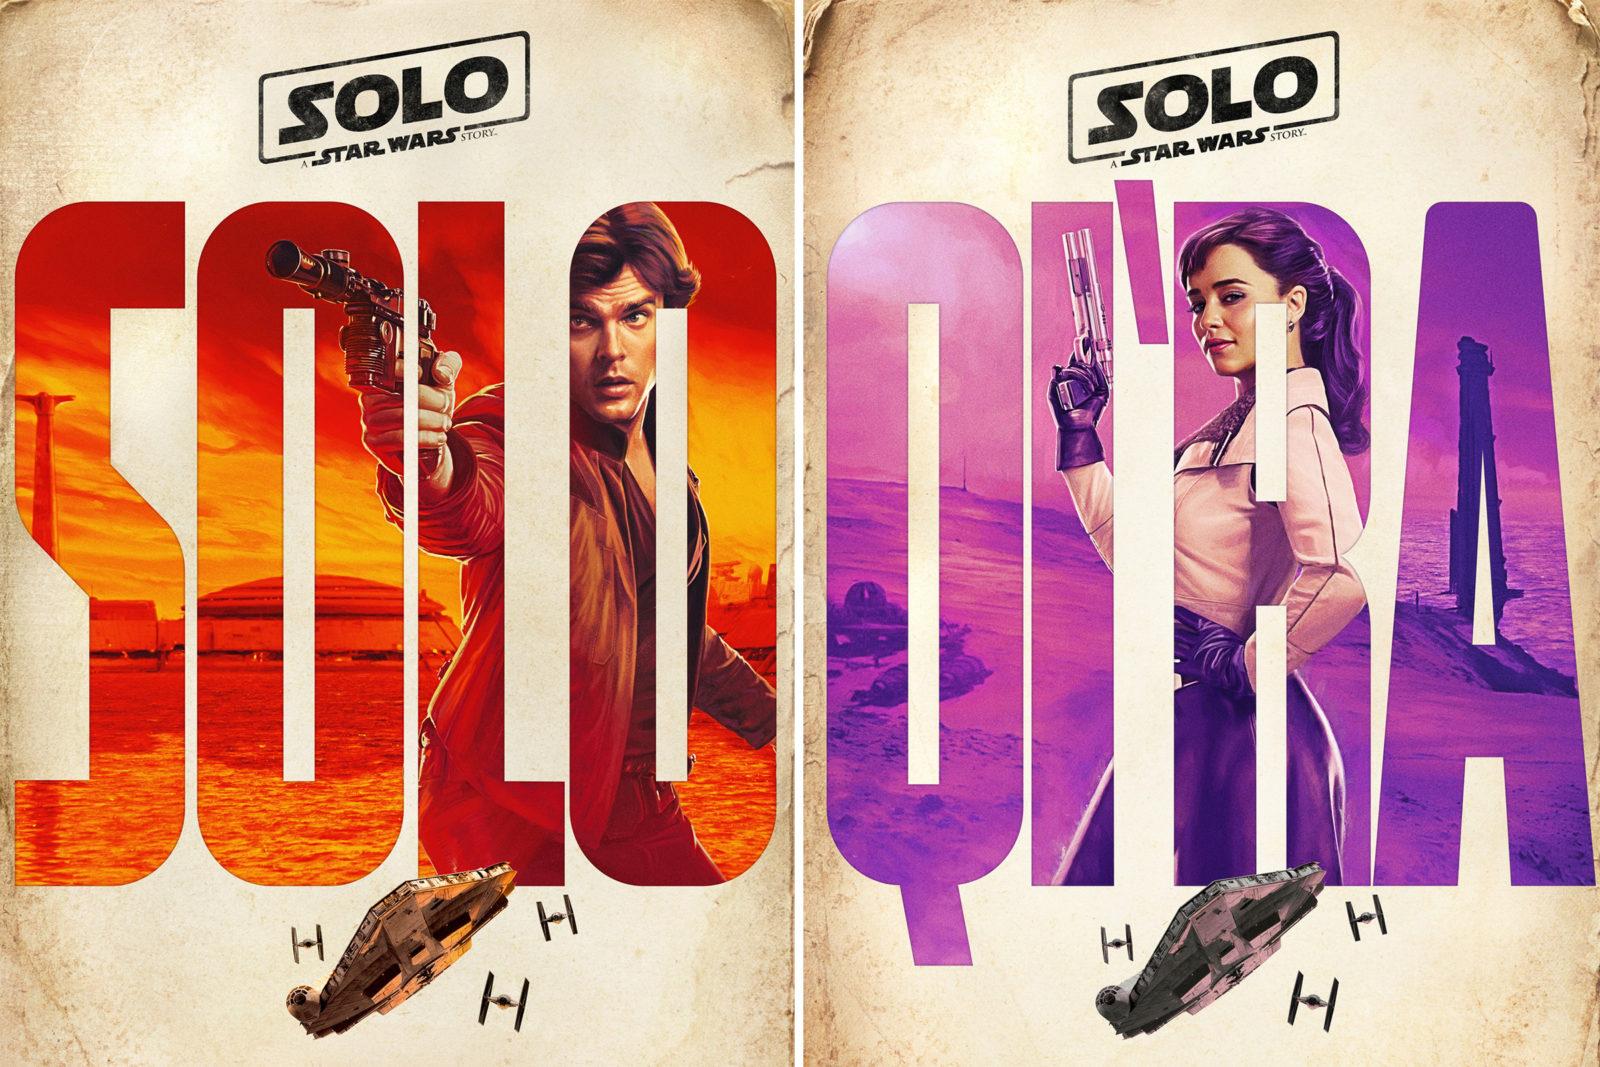 Full Teaser Trailer for Solo: A Star Wars Story